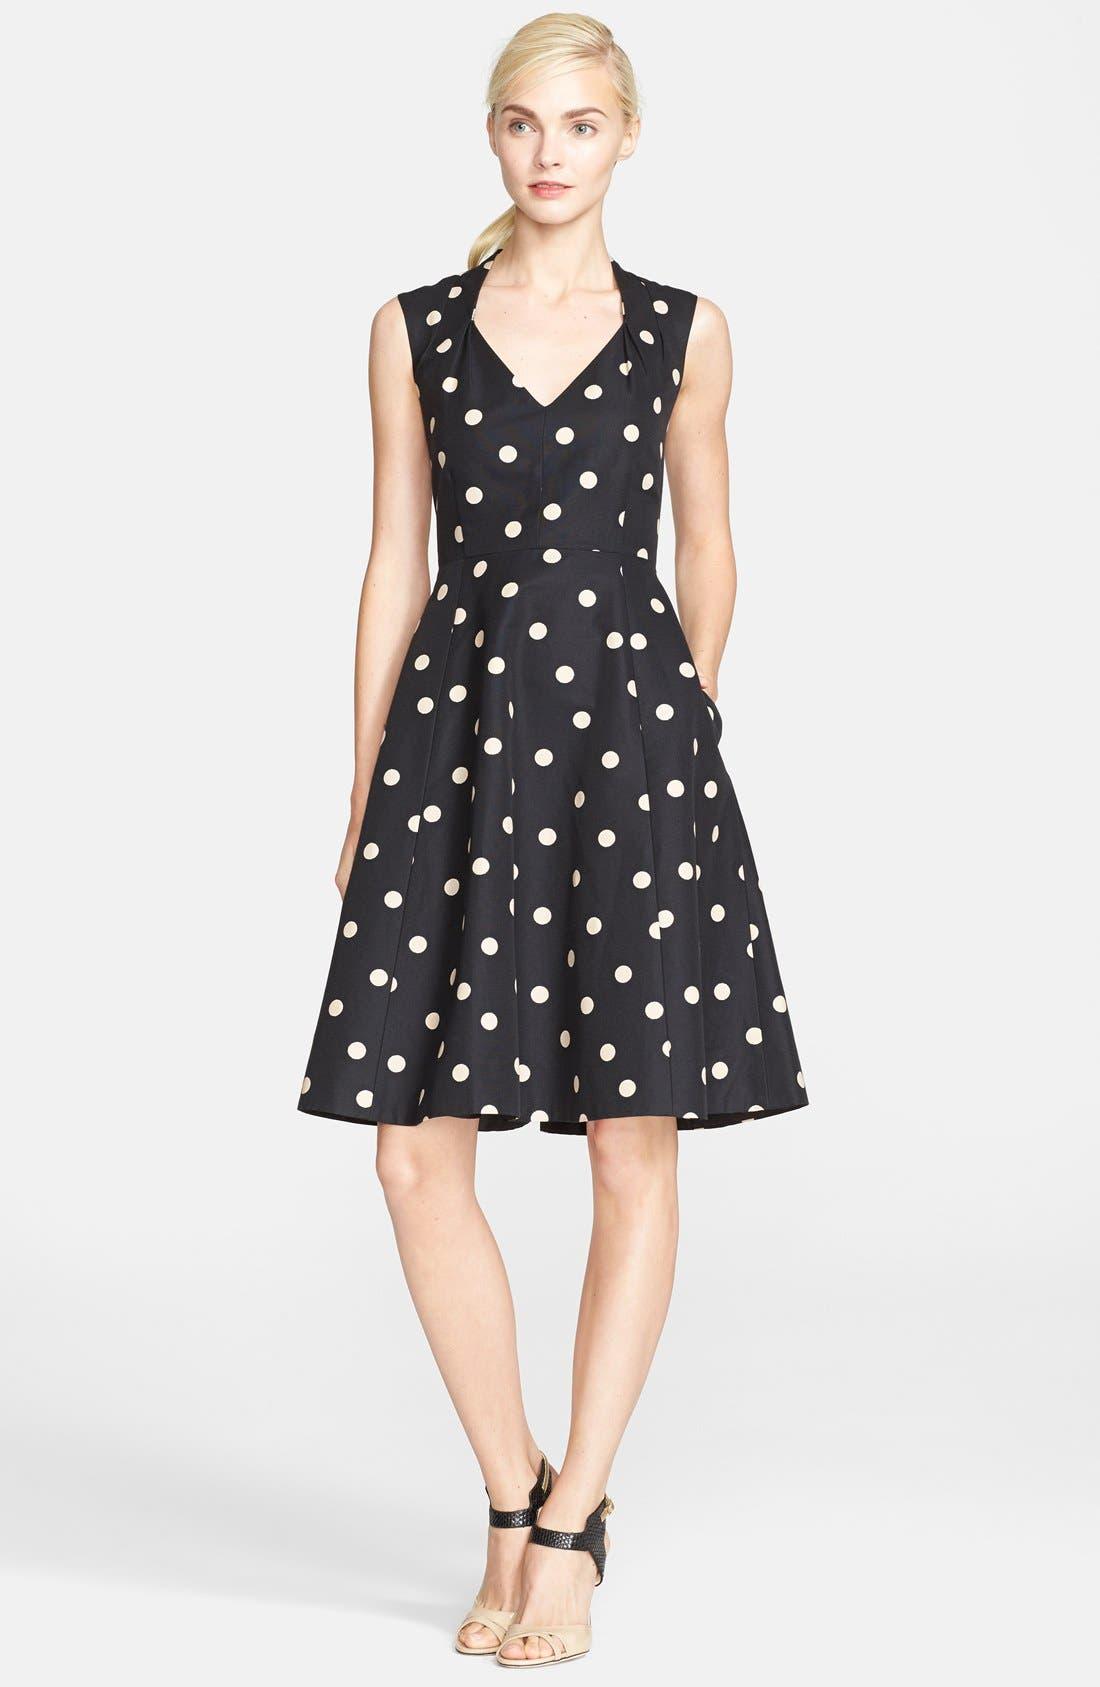 Alternate Image 1 Selected - kate spade new york 'deco dot' fit & flare dress